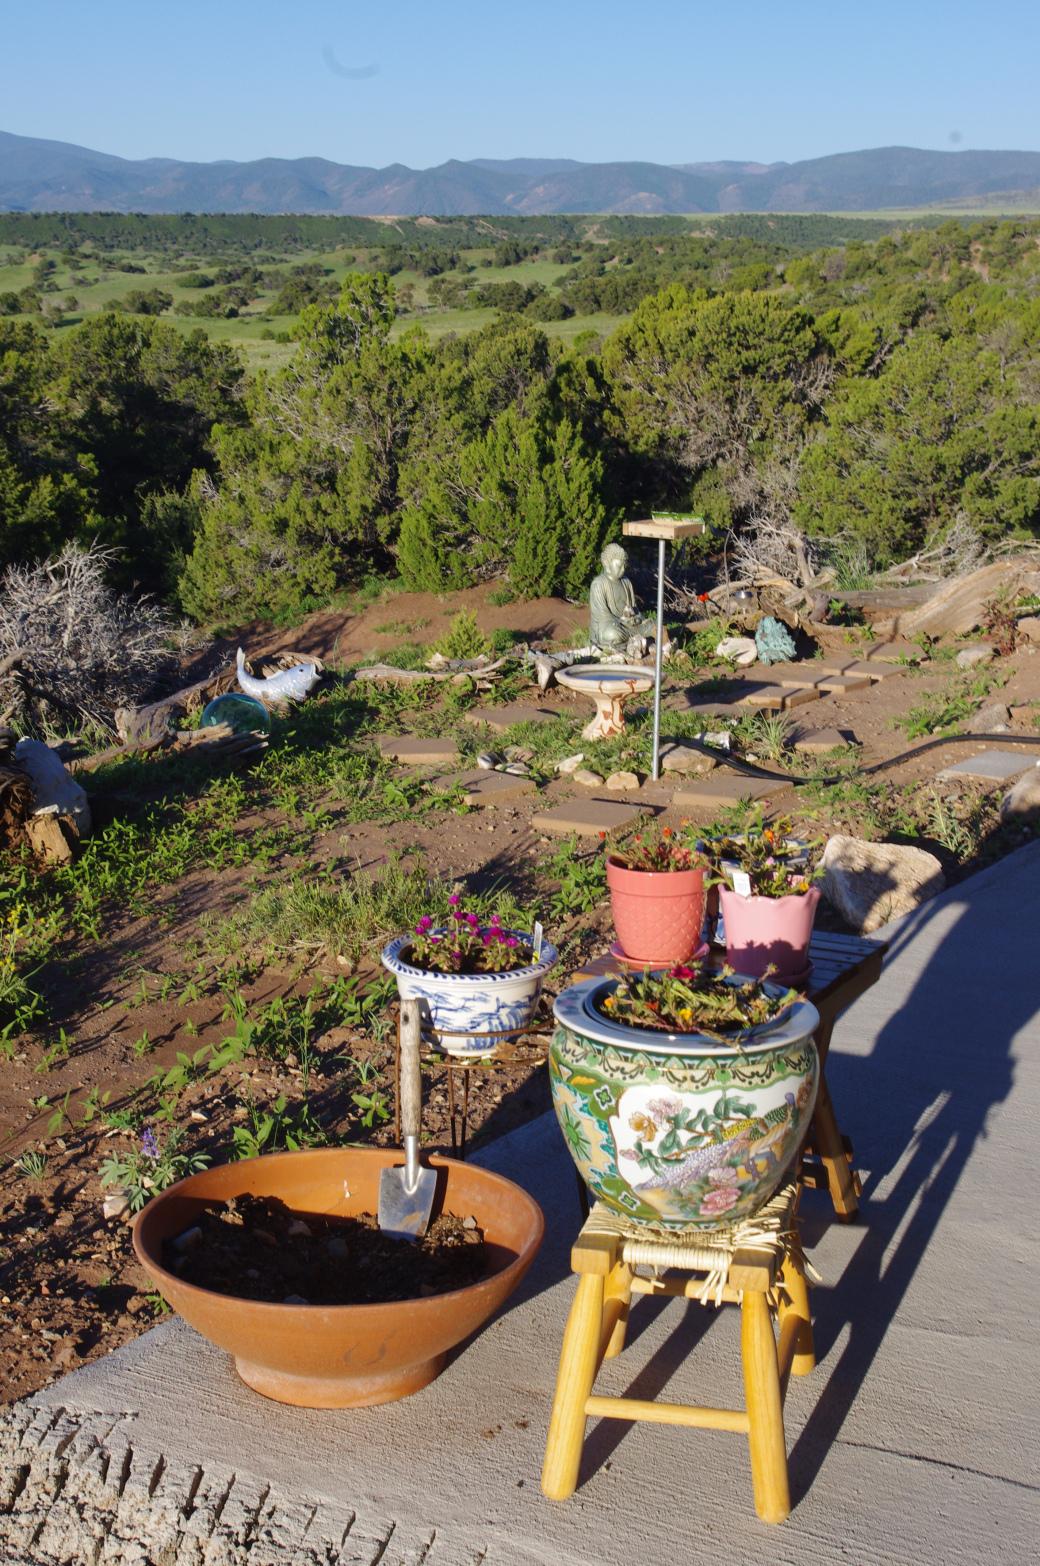 nice garden scene at comanche drive